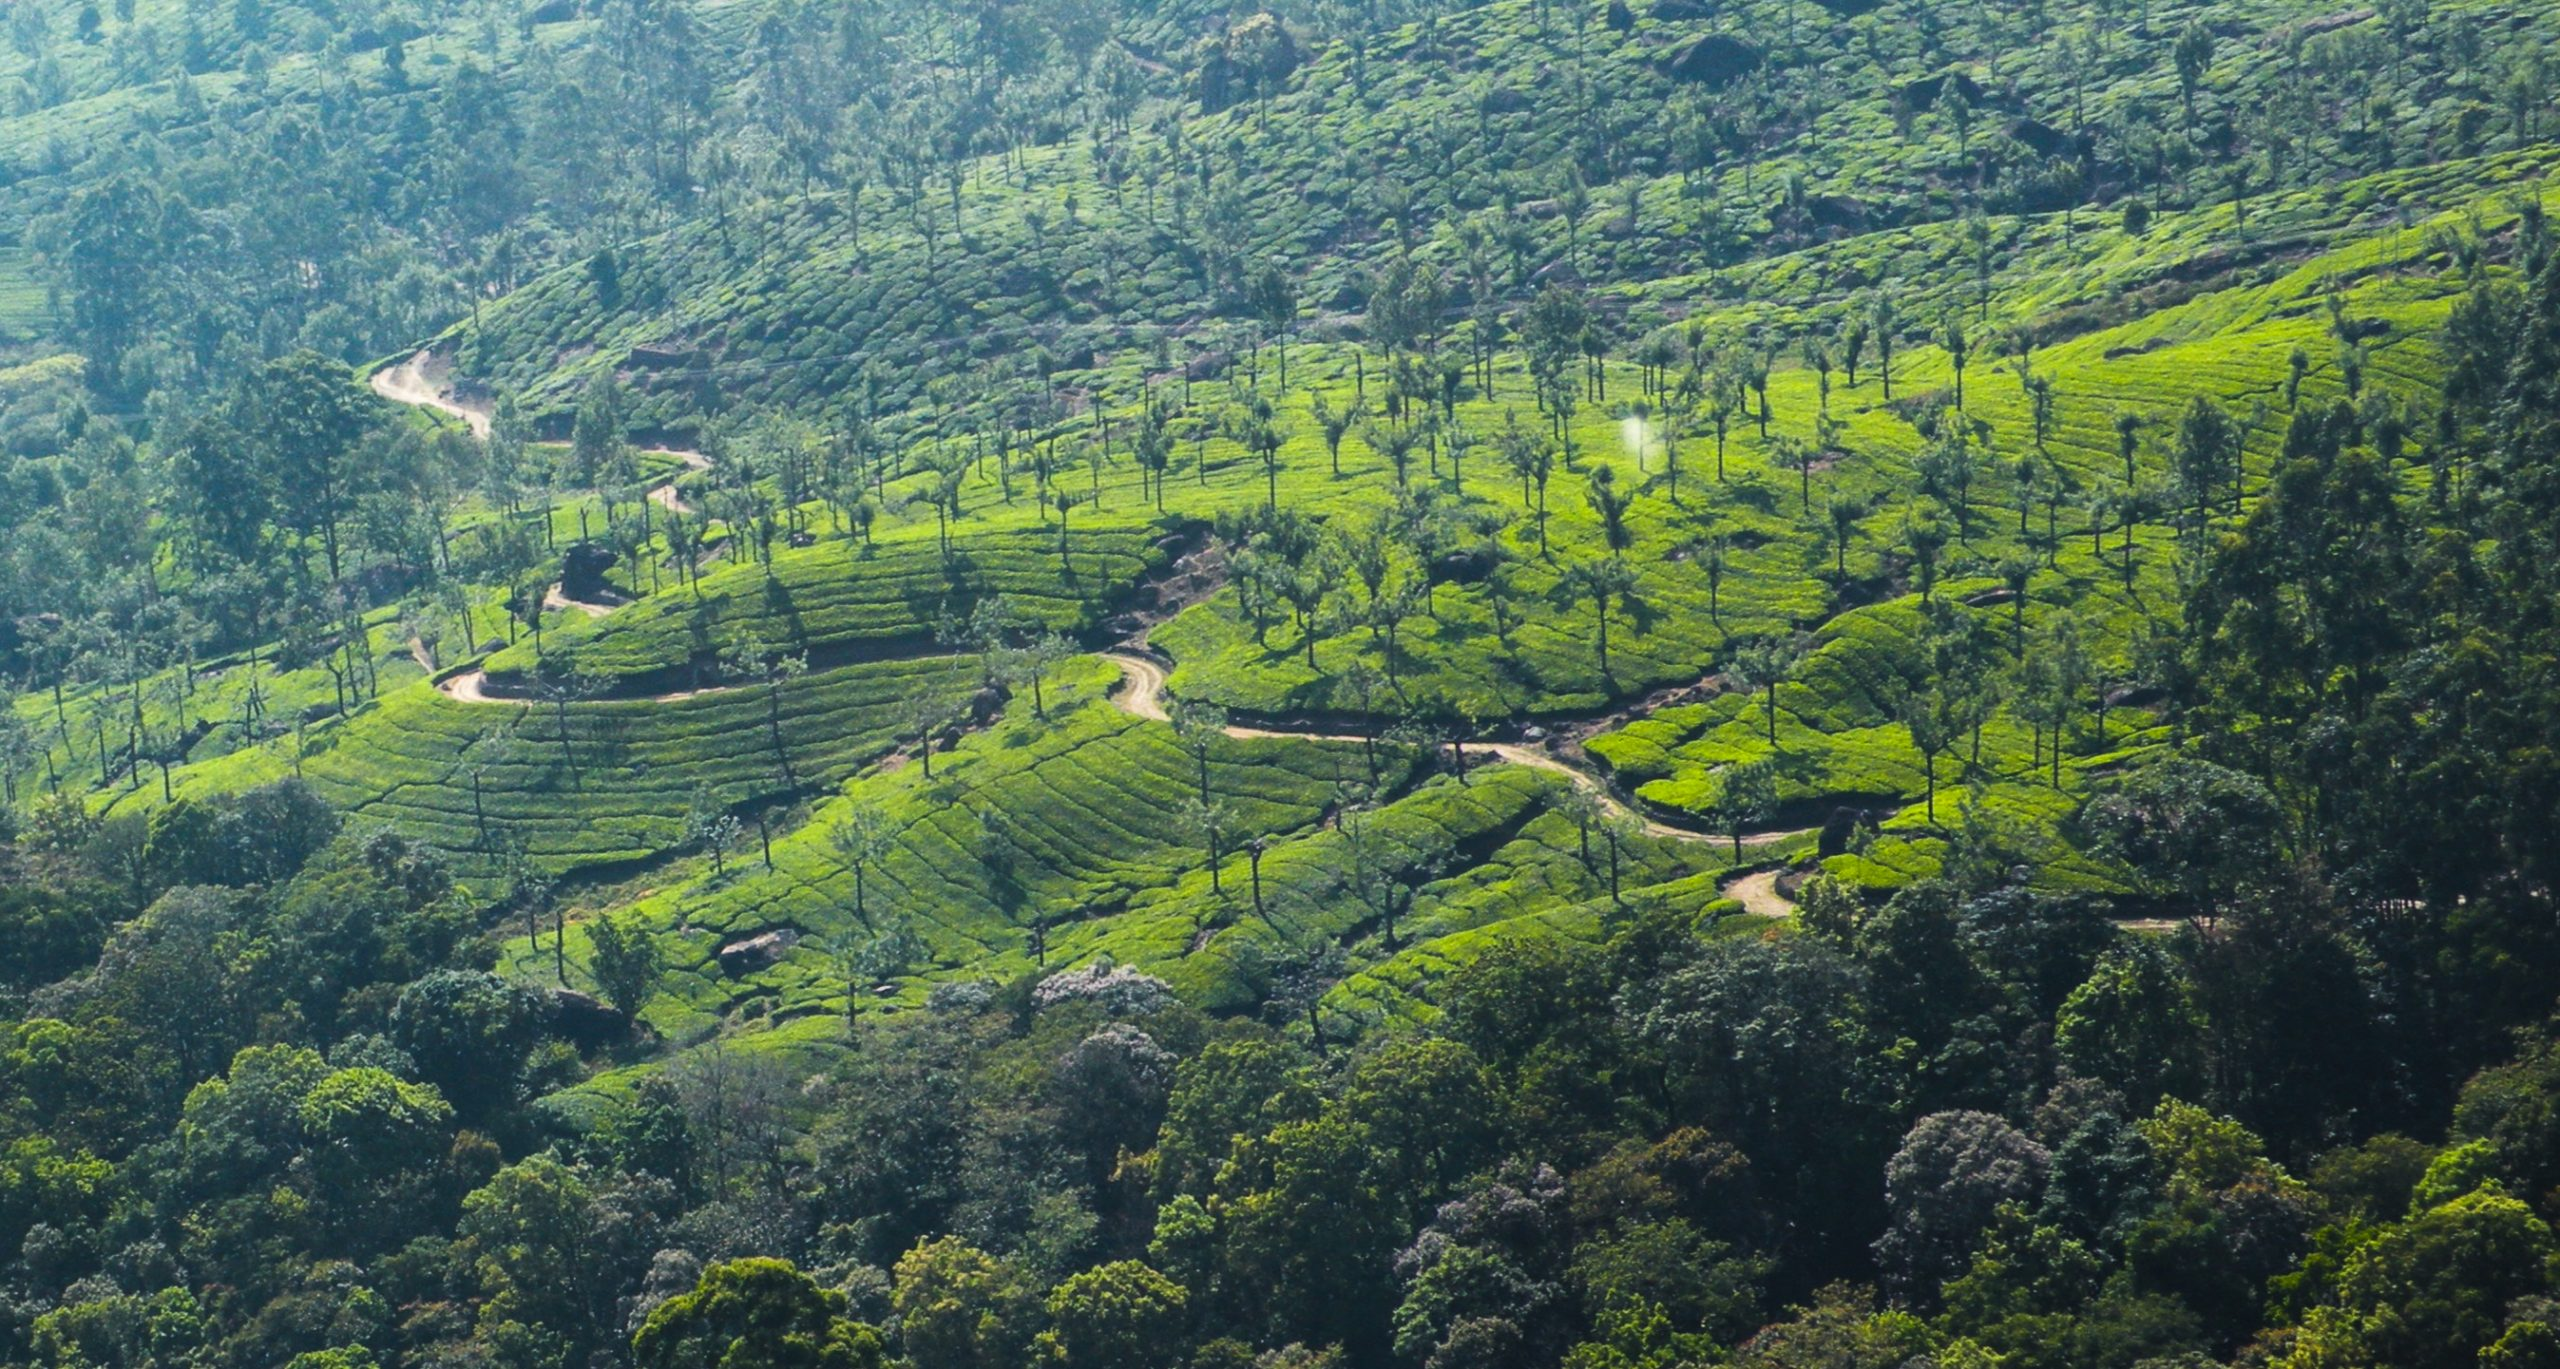 vegetation on hills